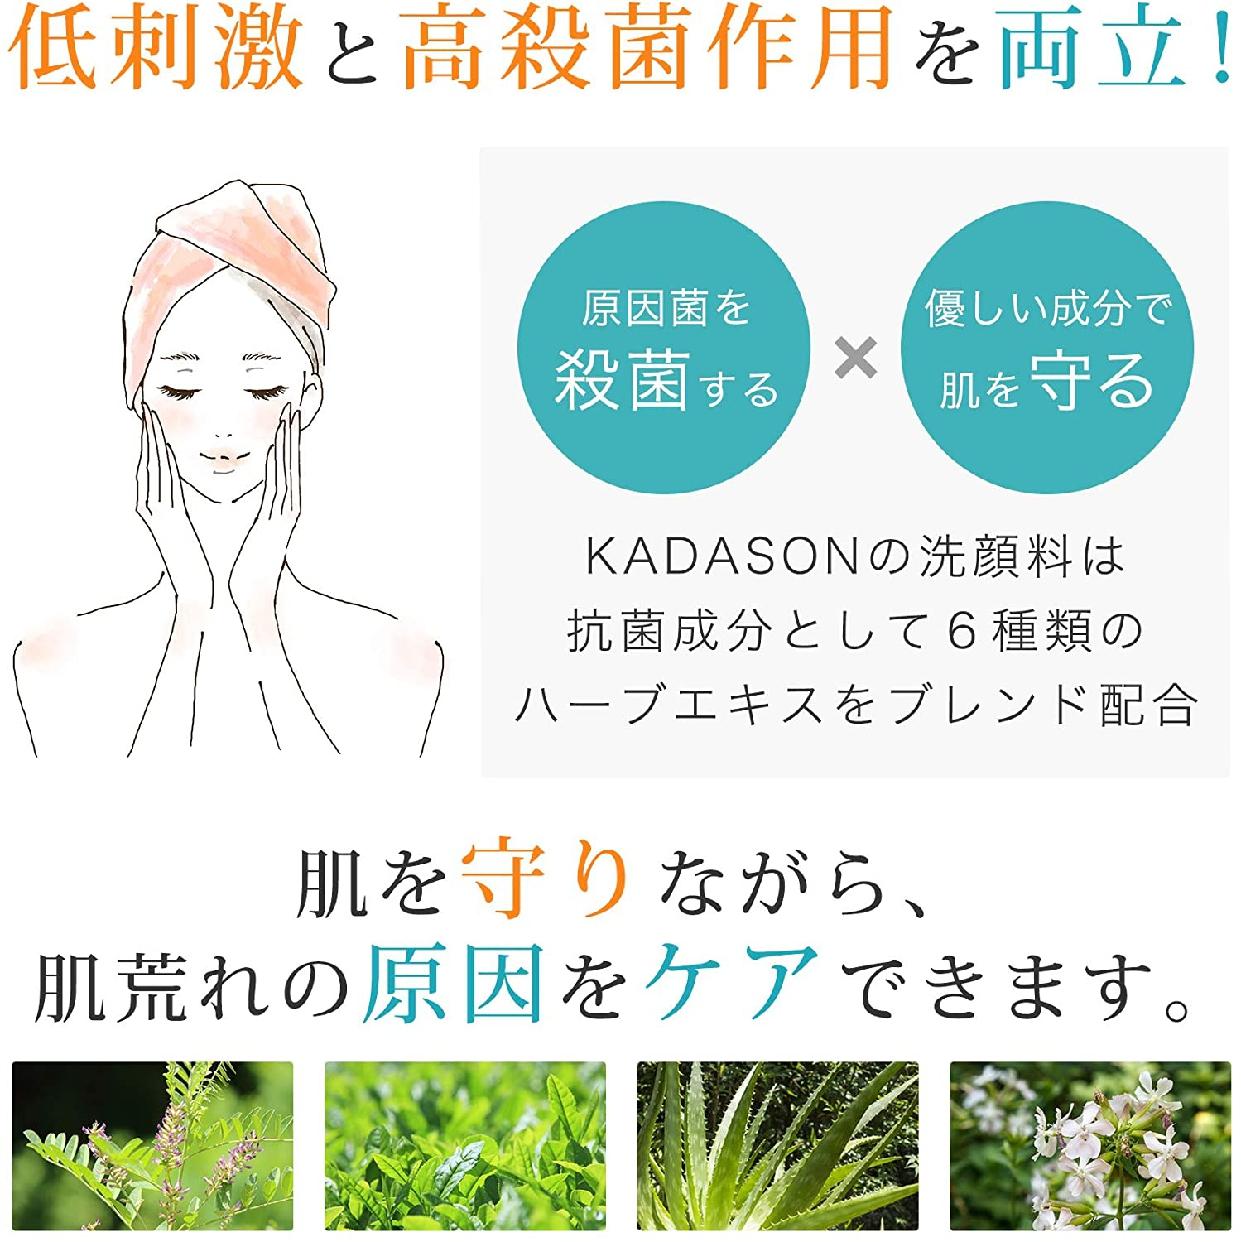 KADASON(カダソン) スキンケア 洗顔フォームの商品画像3